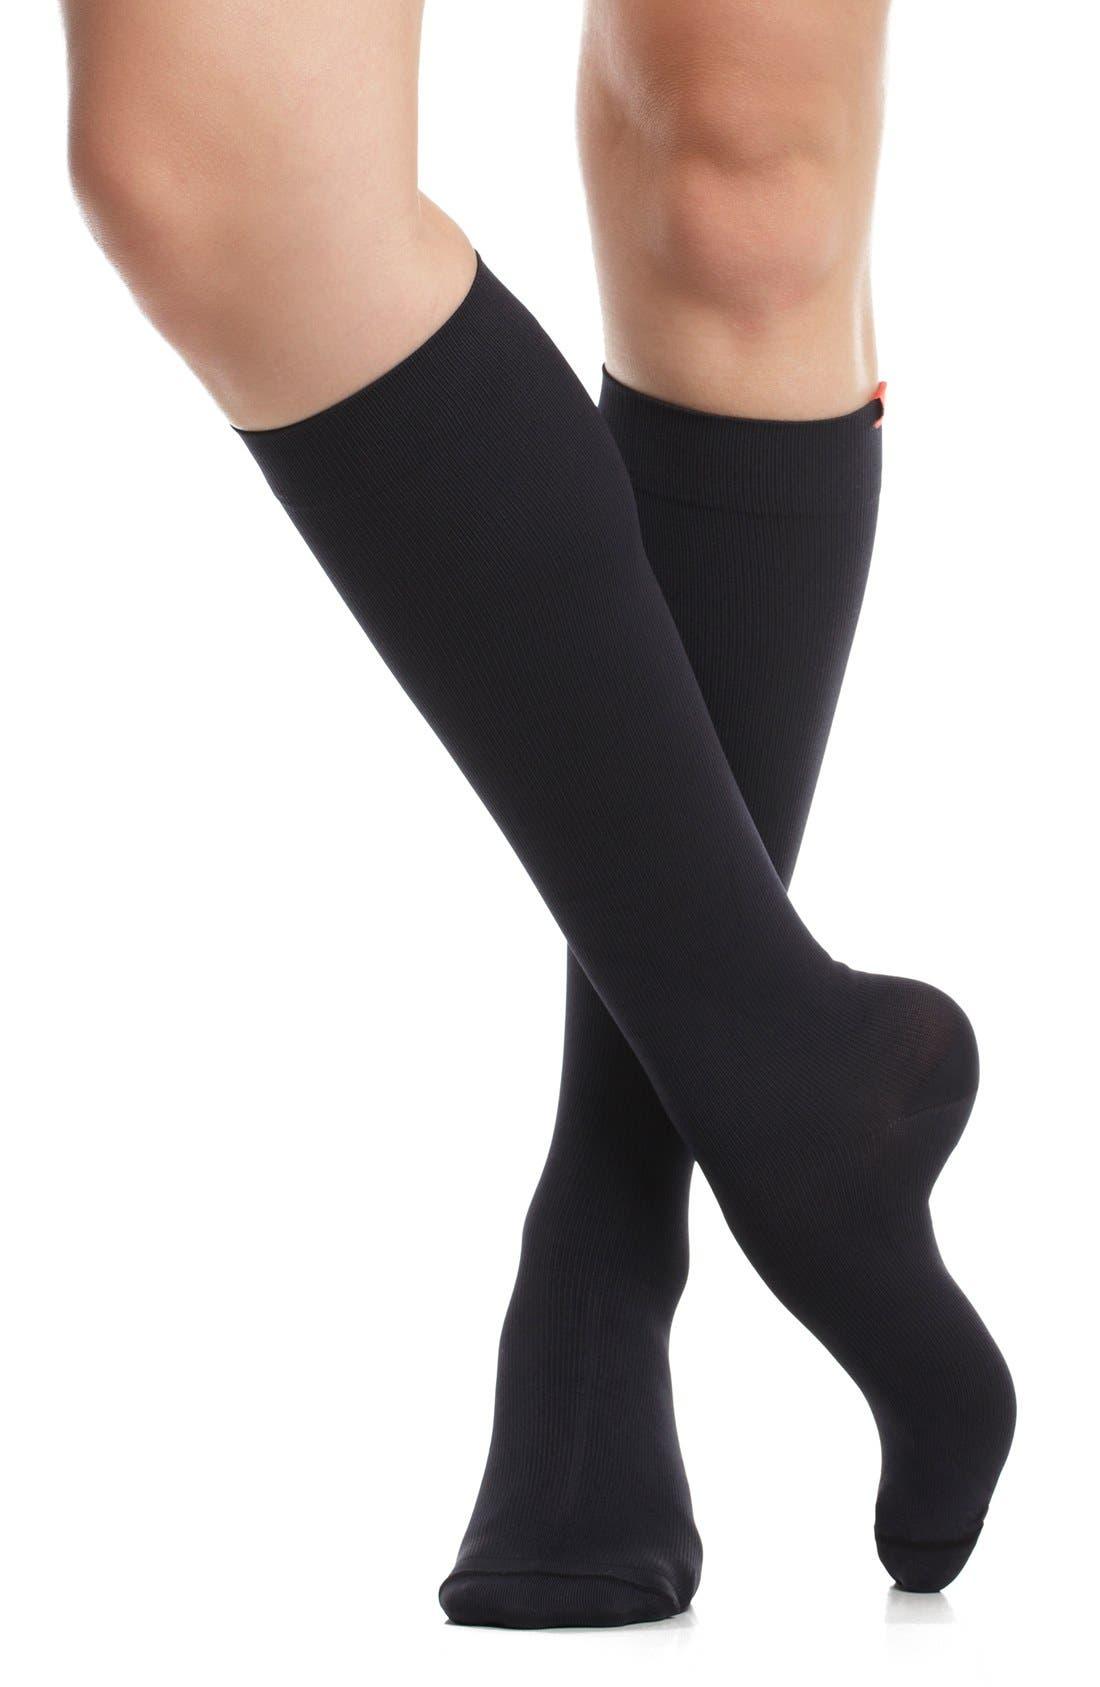 Solid Graduated Compression Trouser Socks,                             Alternate thumbnail 3, color,                             BLACK